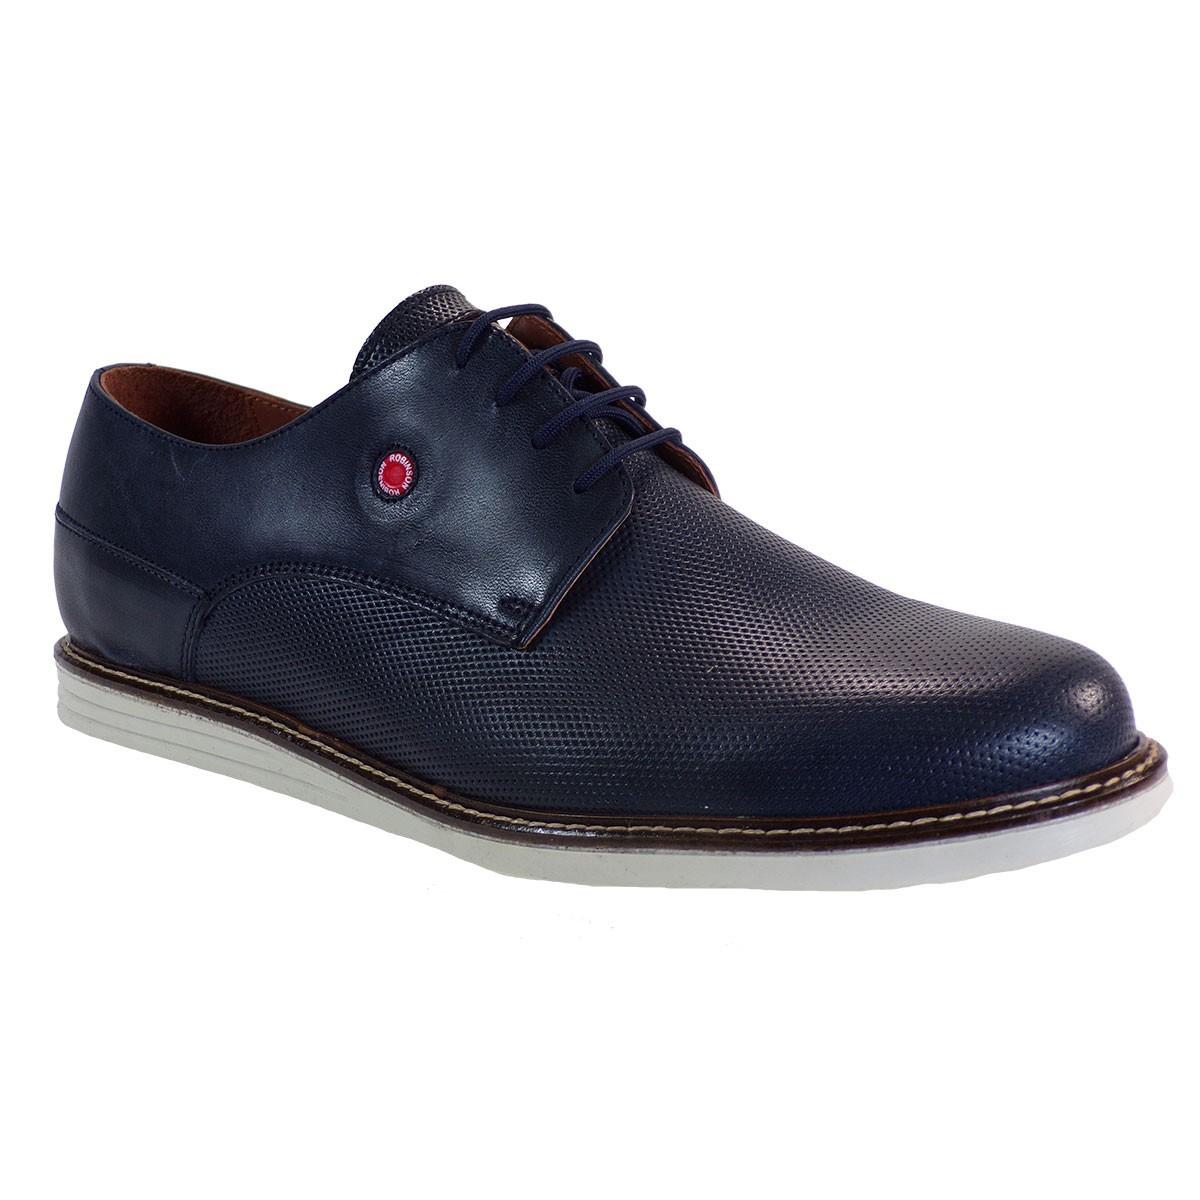 Robinson Ανδρικά Παπούτσια 1927 Mπλέ Δέρμα